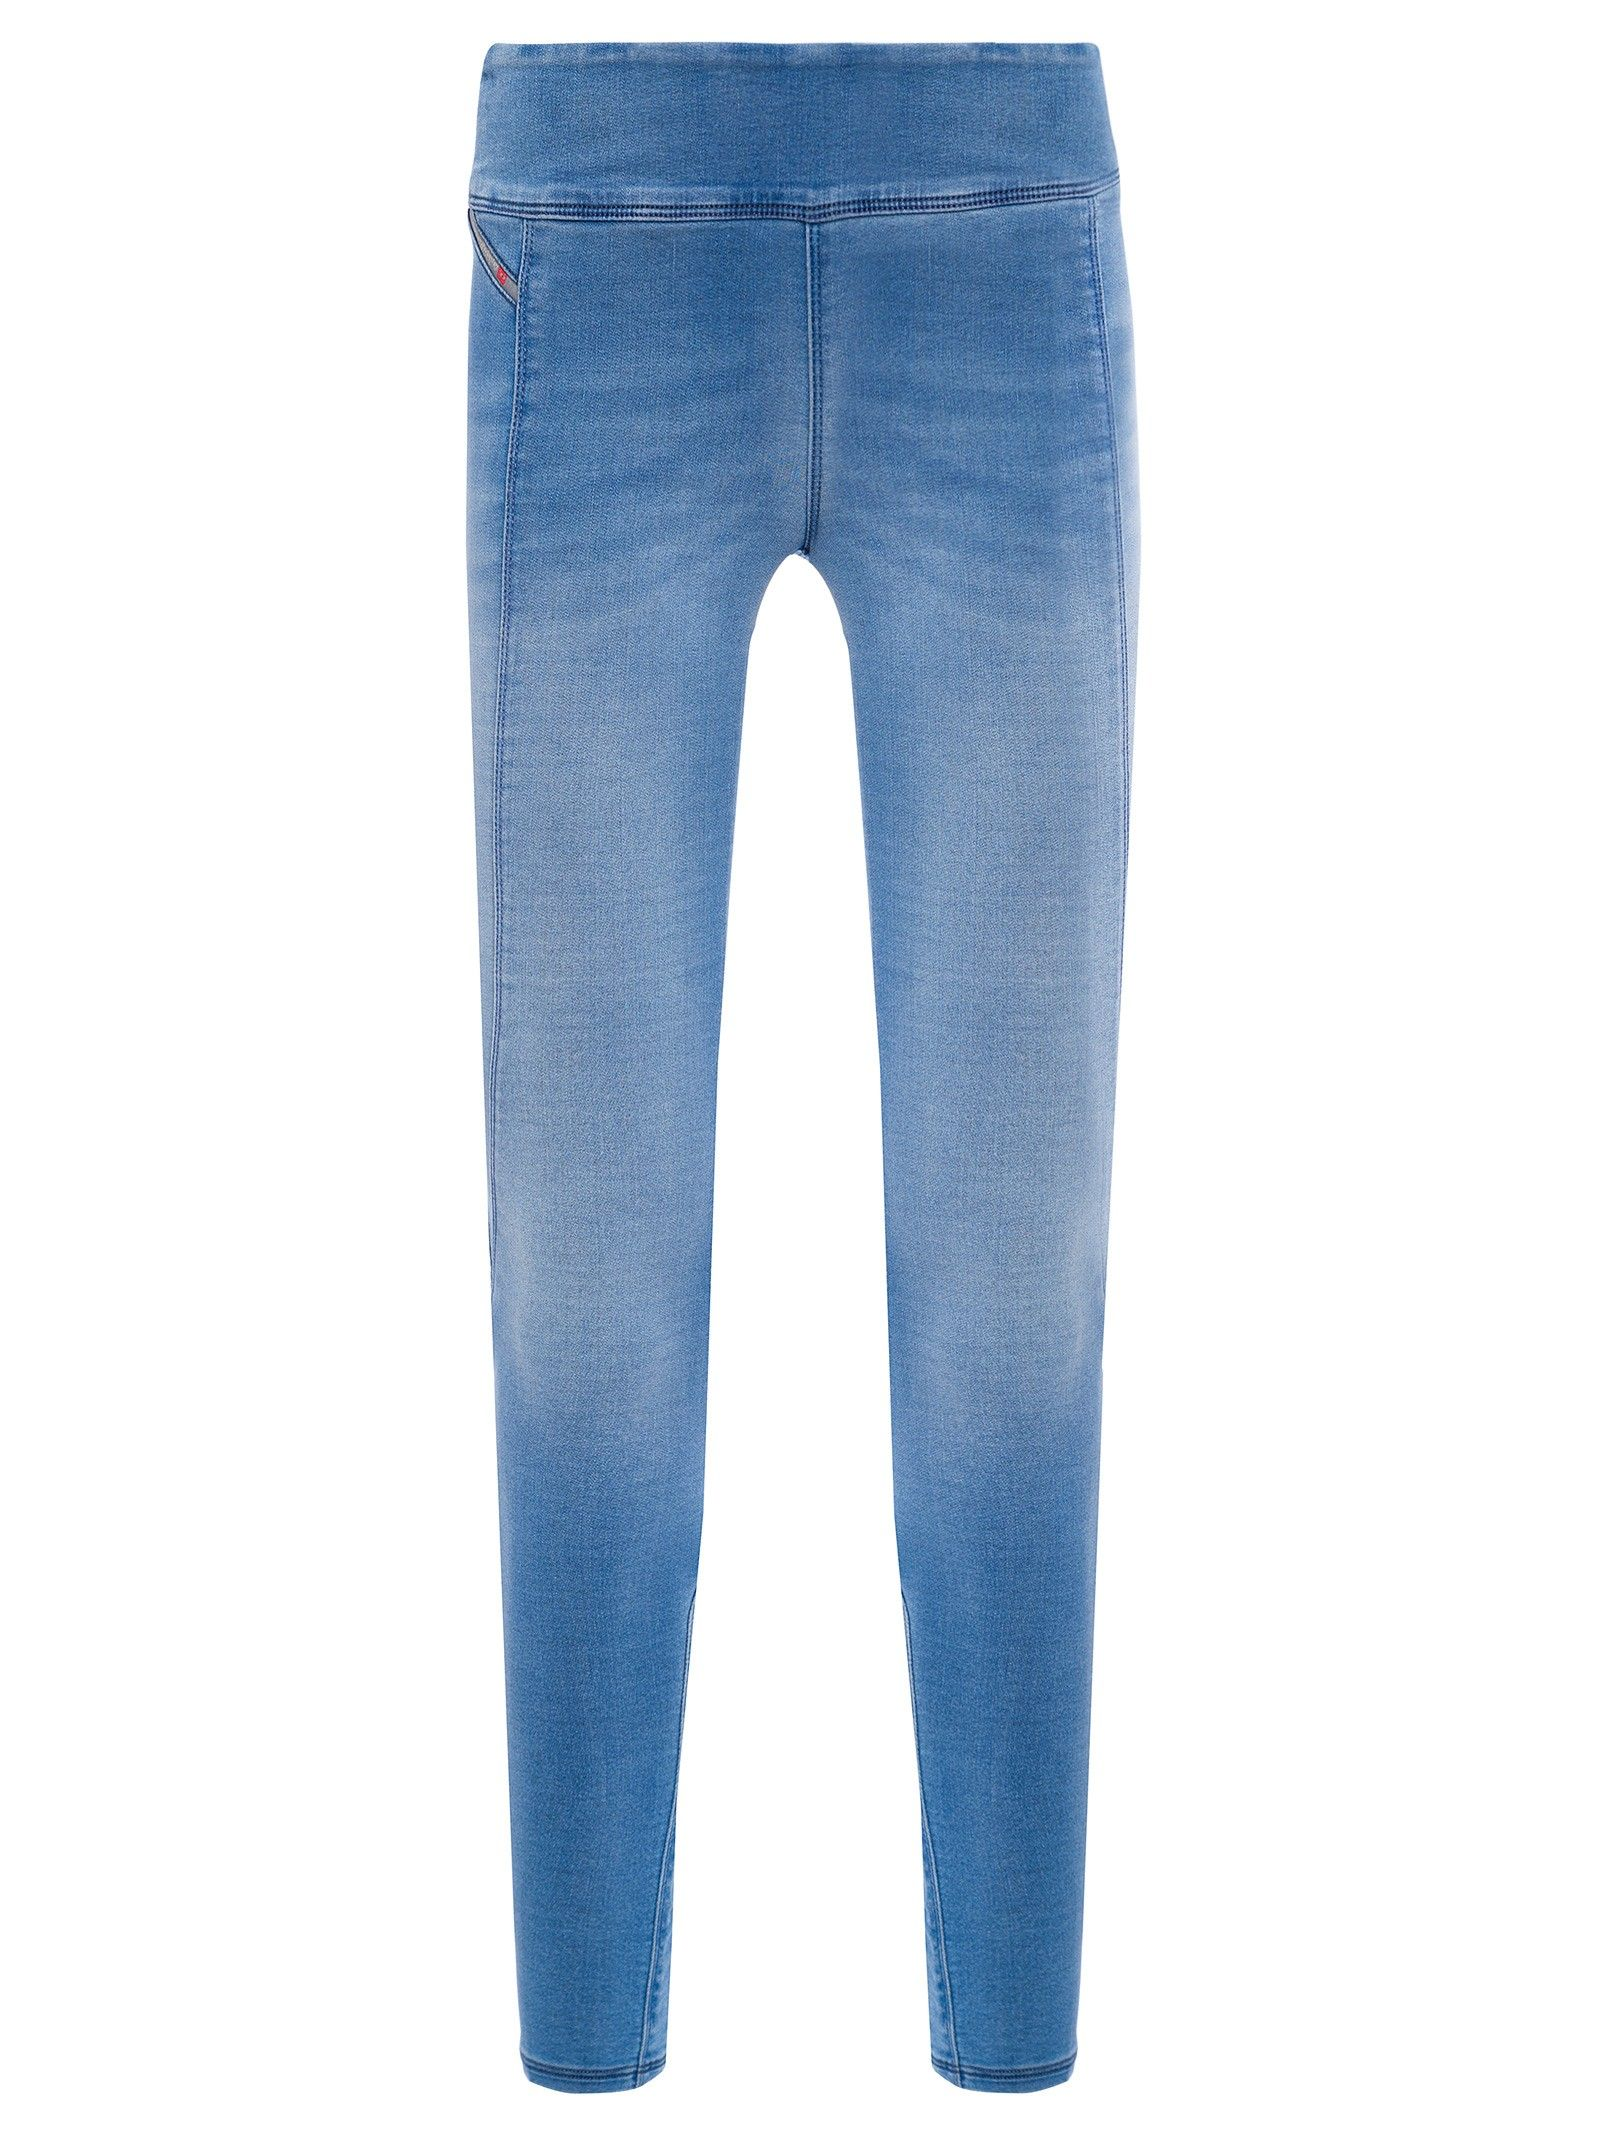 4c58247a2 Calça Feminina Actyvista L.32 Pantaloni - Diesel - Azul - Shop2gether  Women's Jeans,